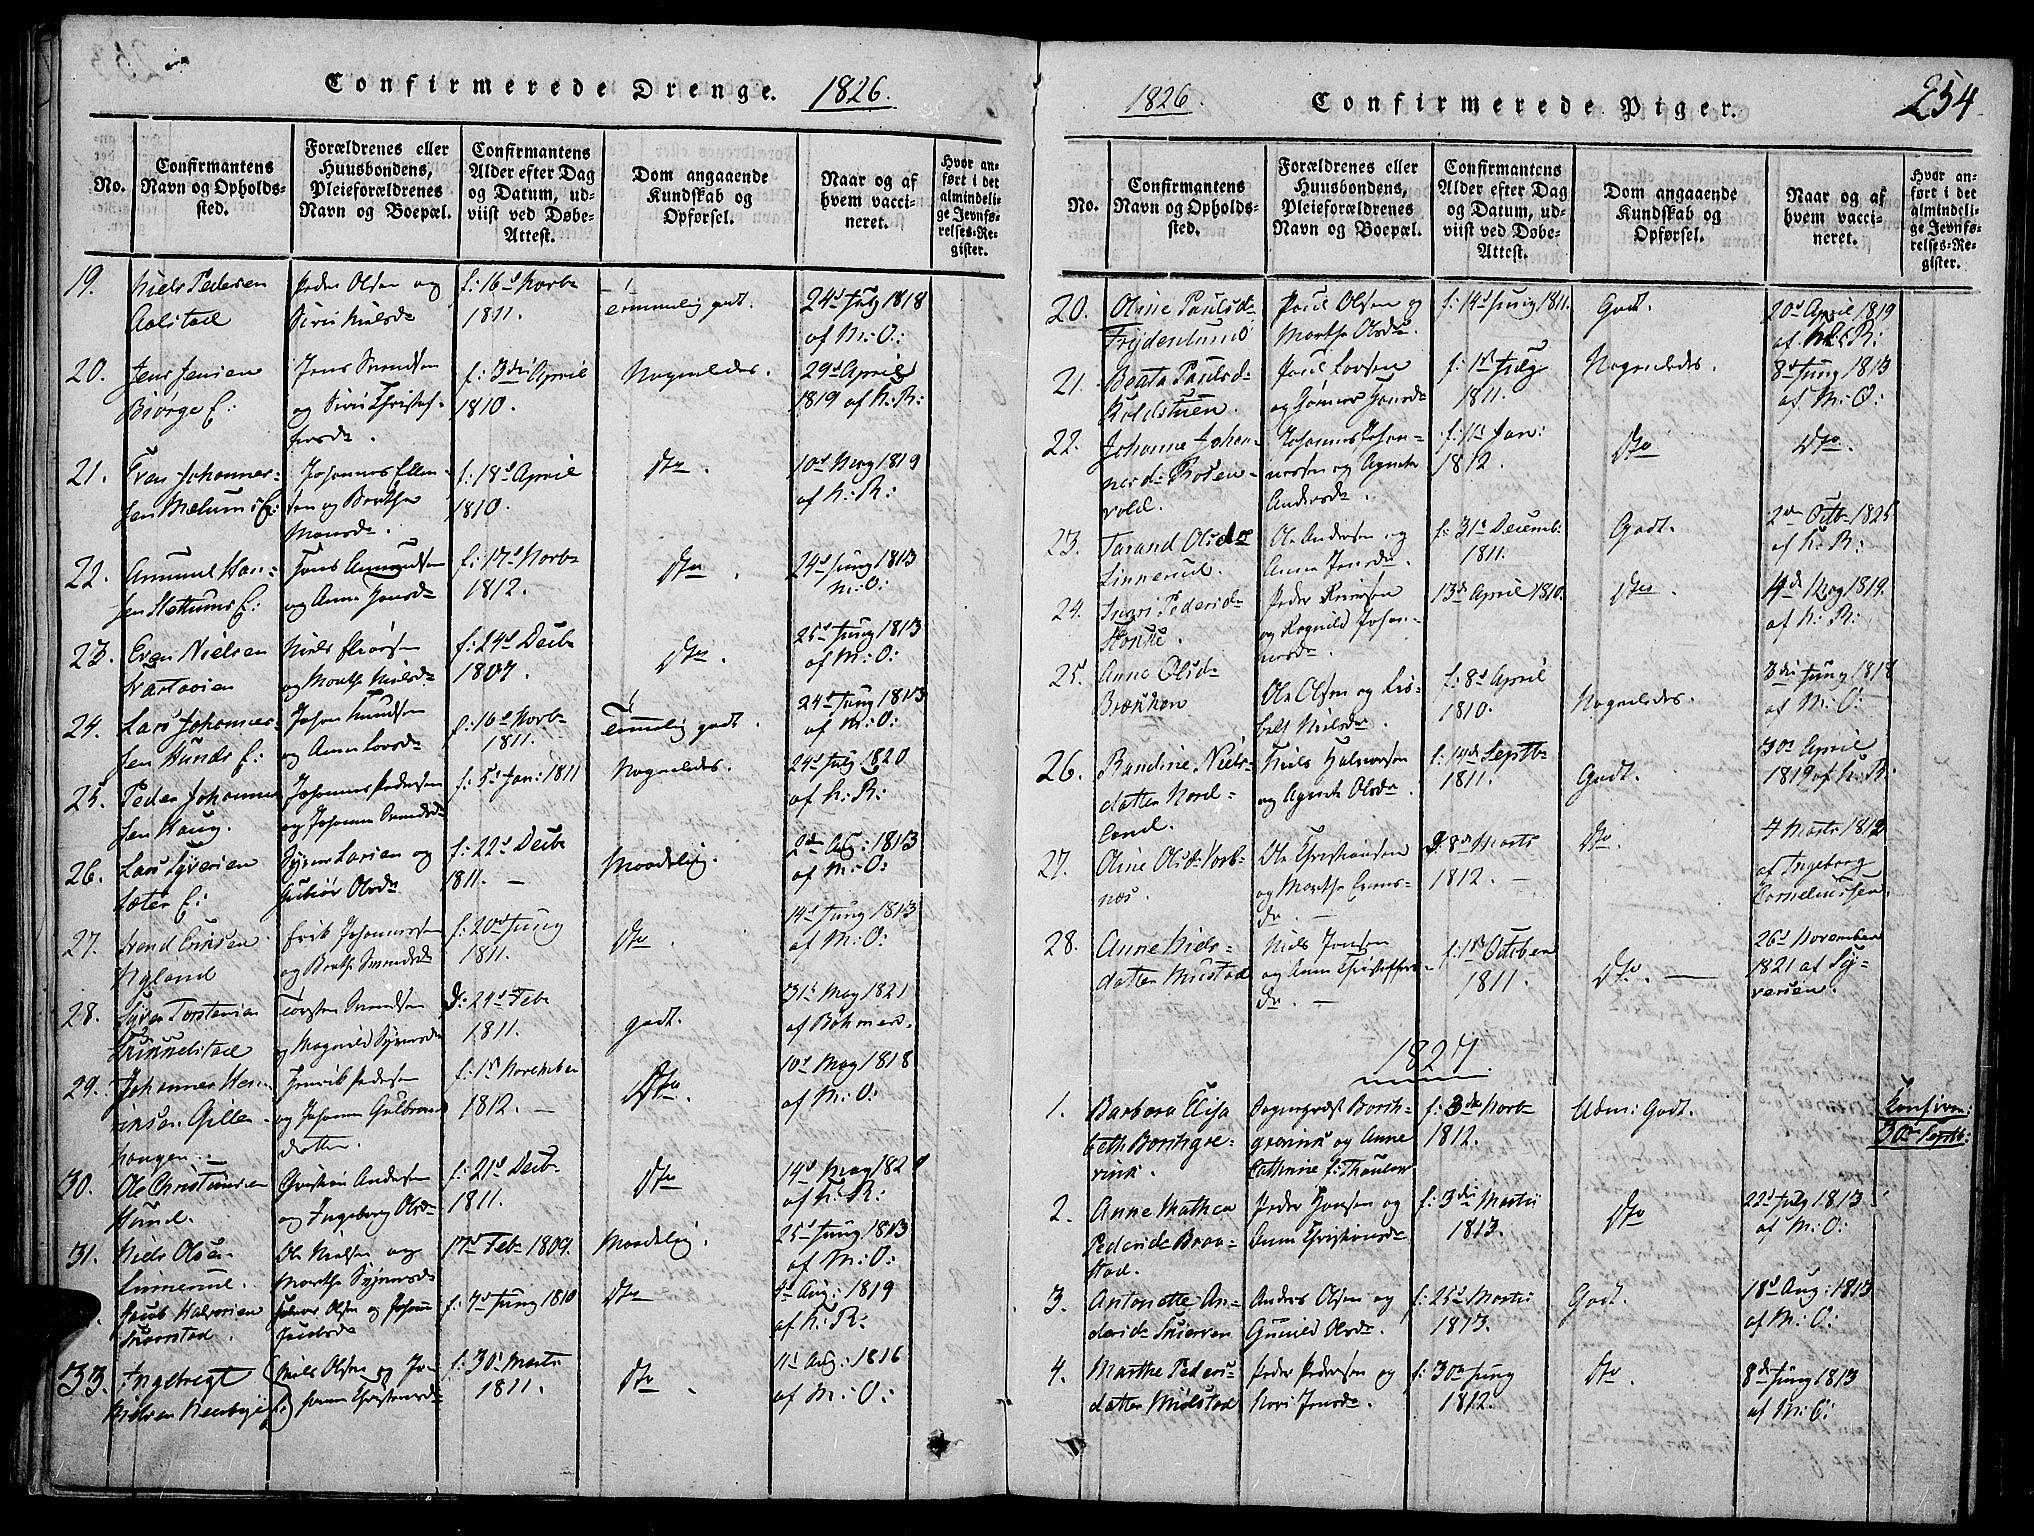 SAH, Vardal prestekontor, H/Ha/Haa/L0004: Ministerialbok nr. 4, 1814-1831, s. 254